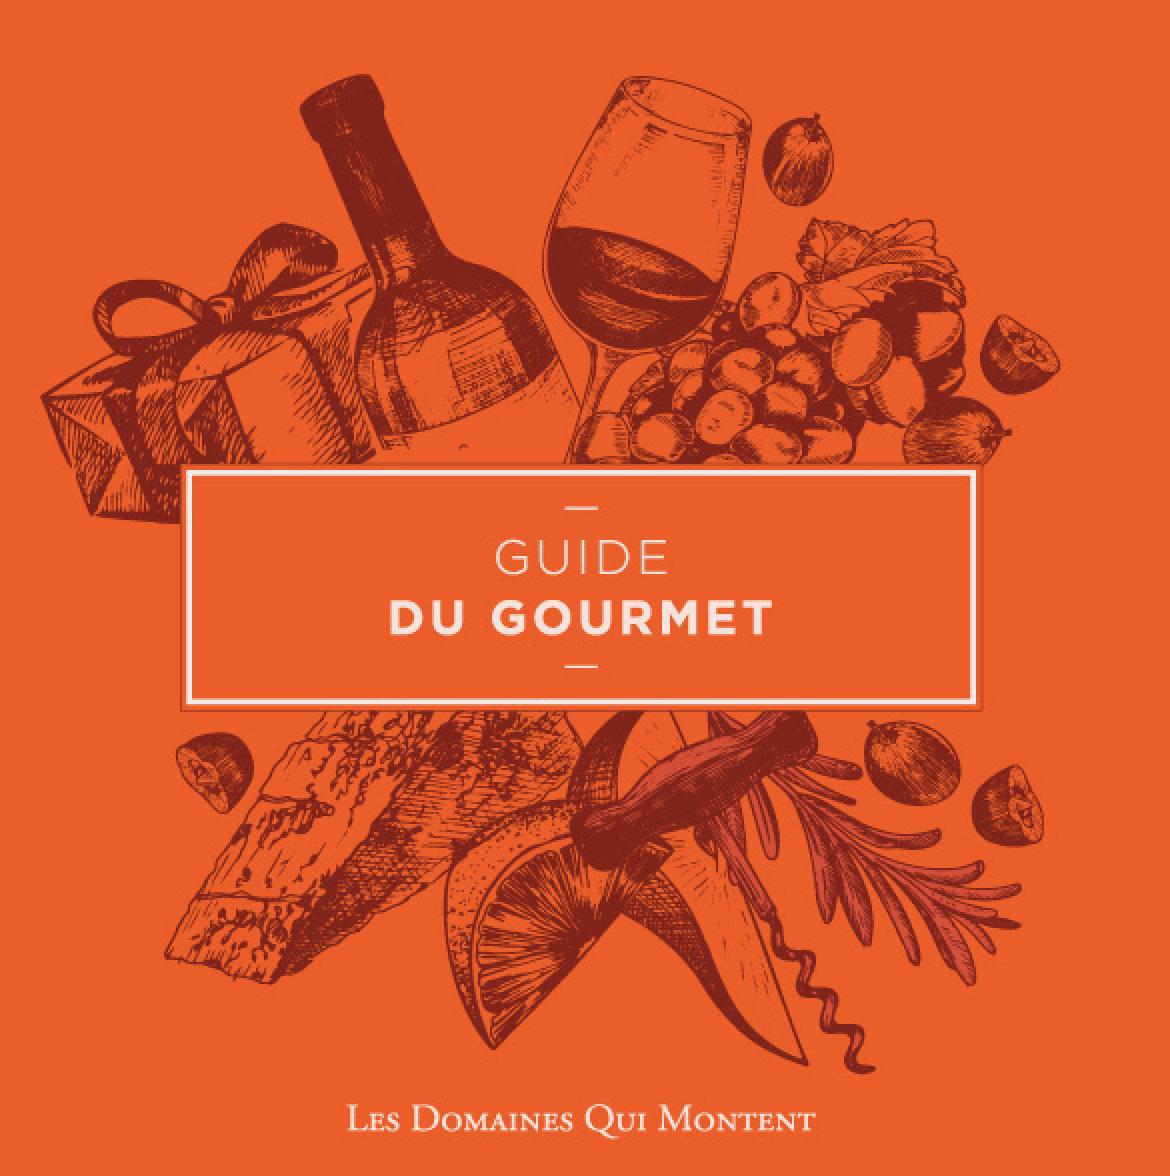 Guide du gourmet 2018